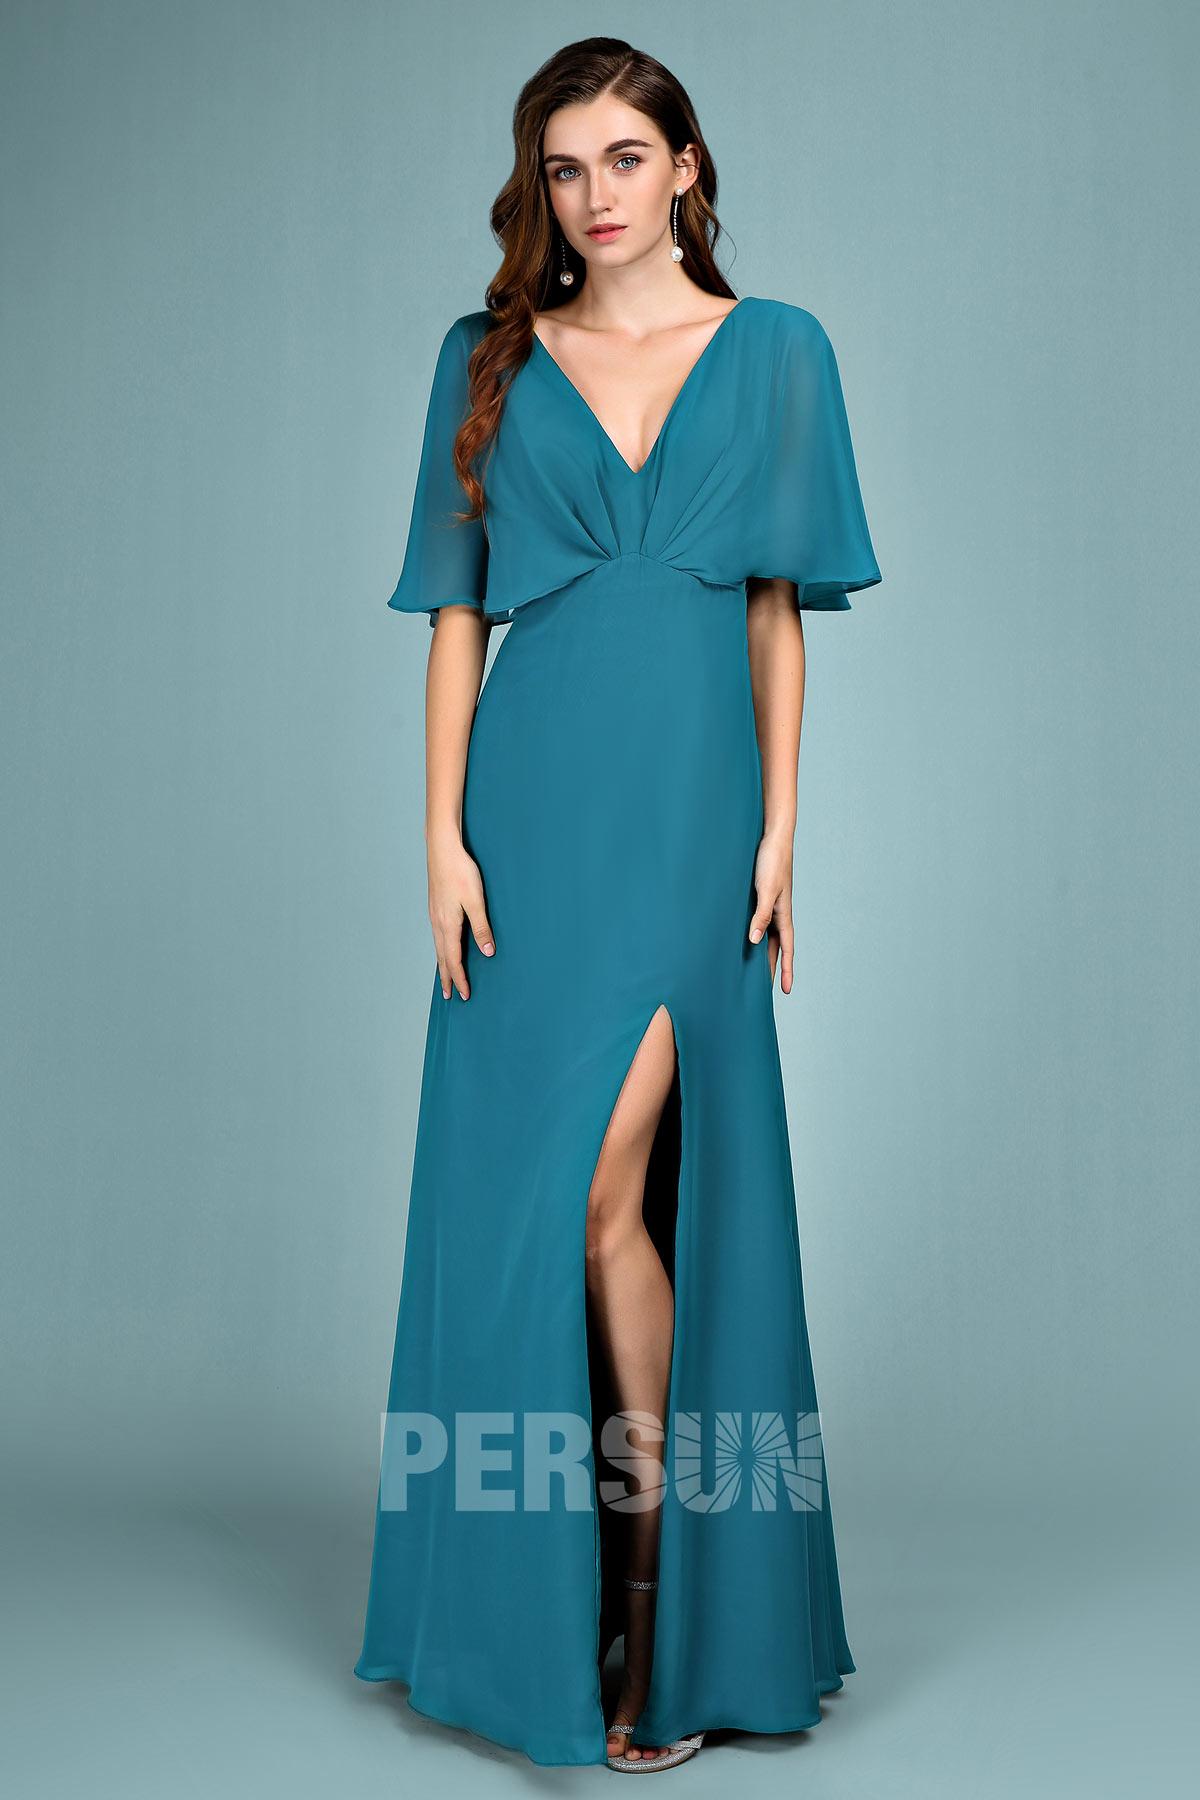 robe de soirée verte longue fendue avec manche col V